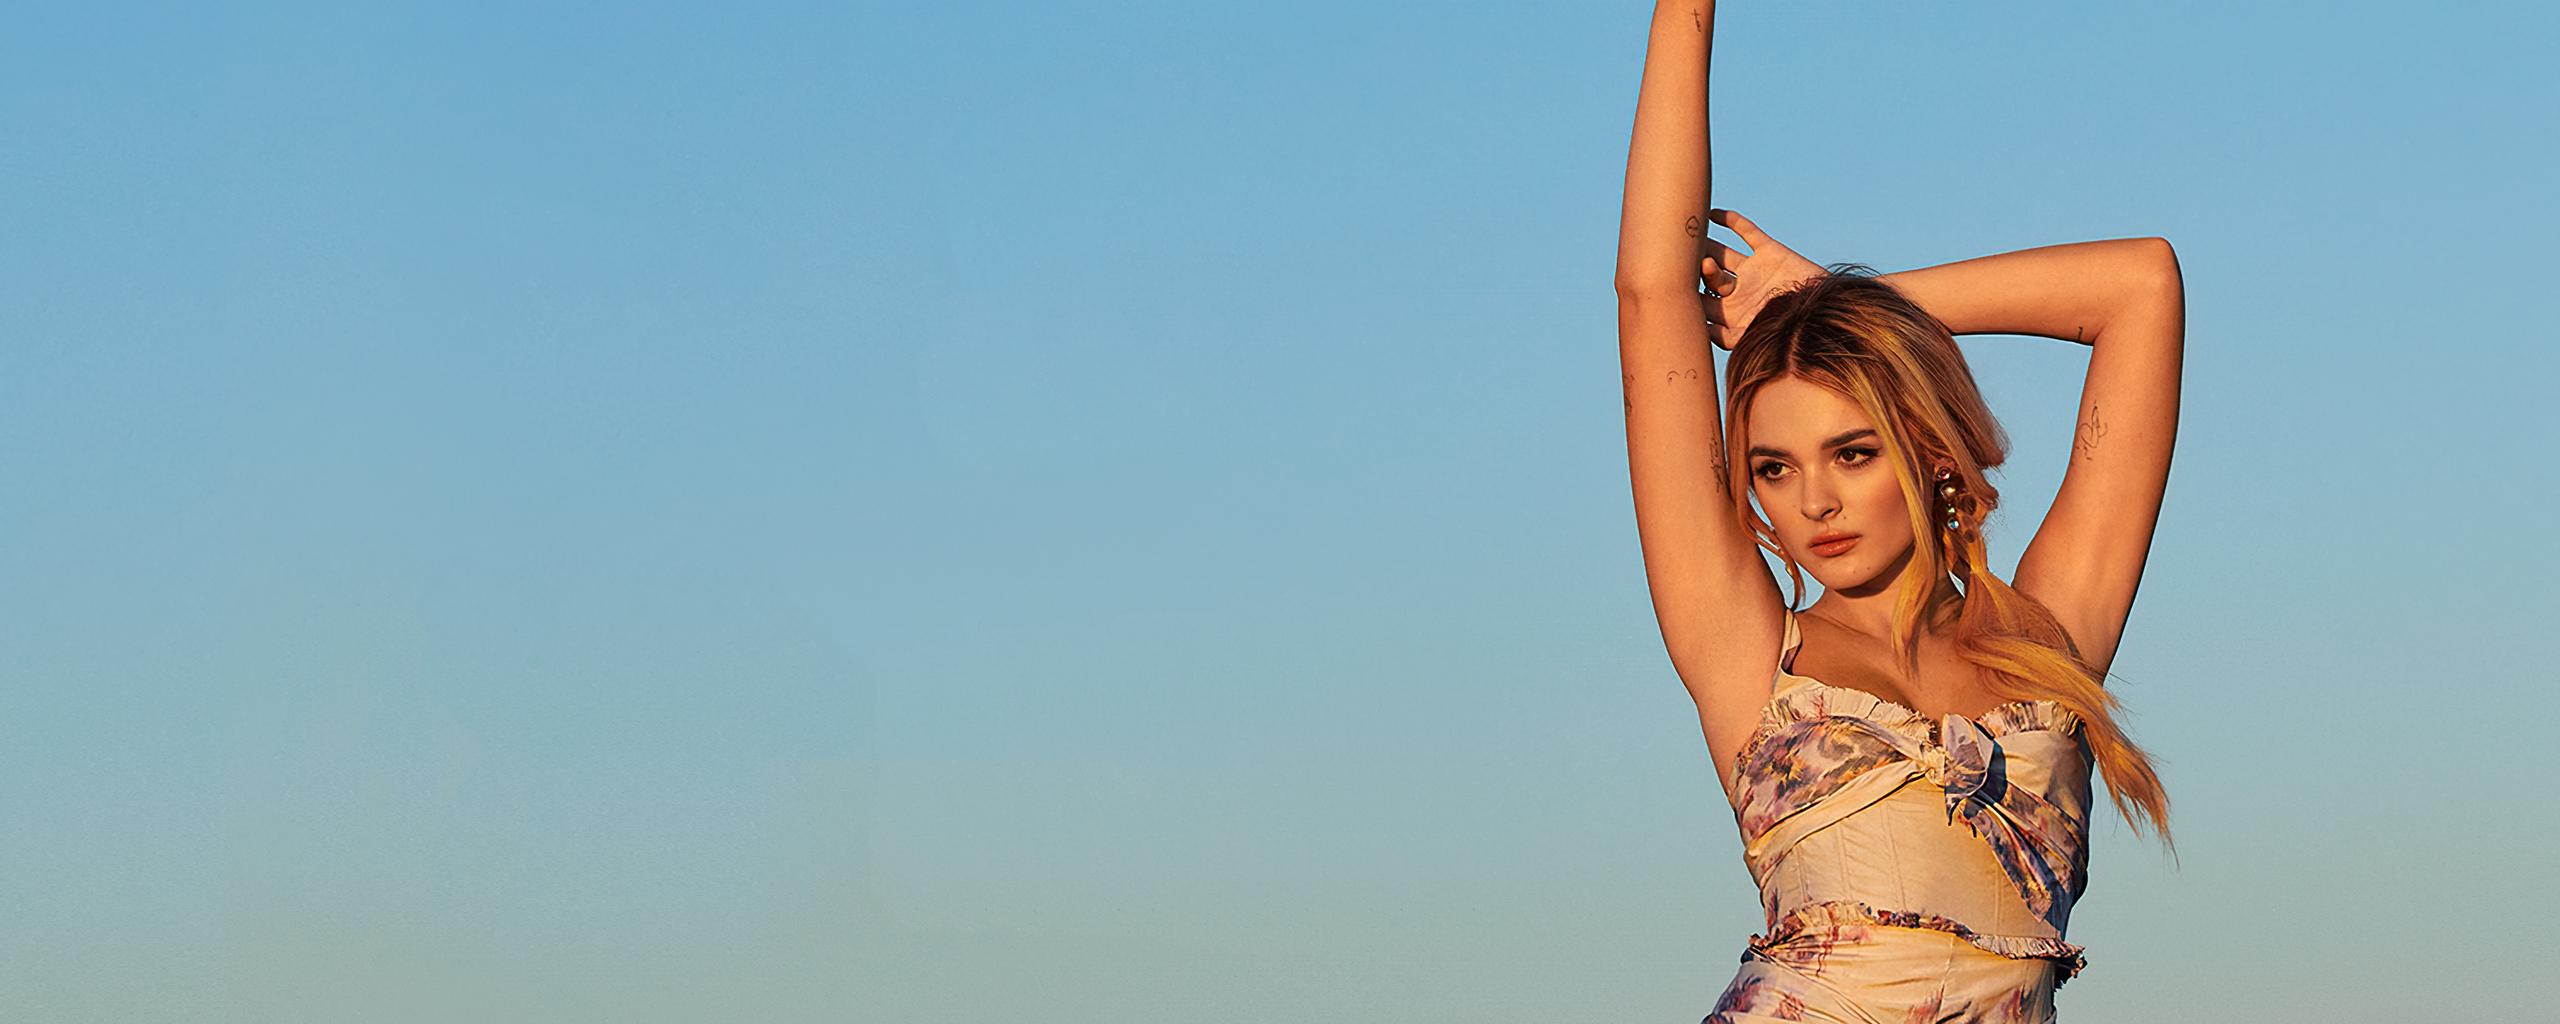 charlotte-lawrence-cosmopolitan-2020-ys.jpg